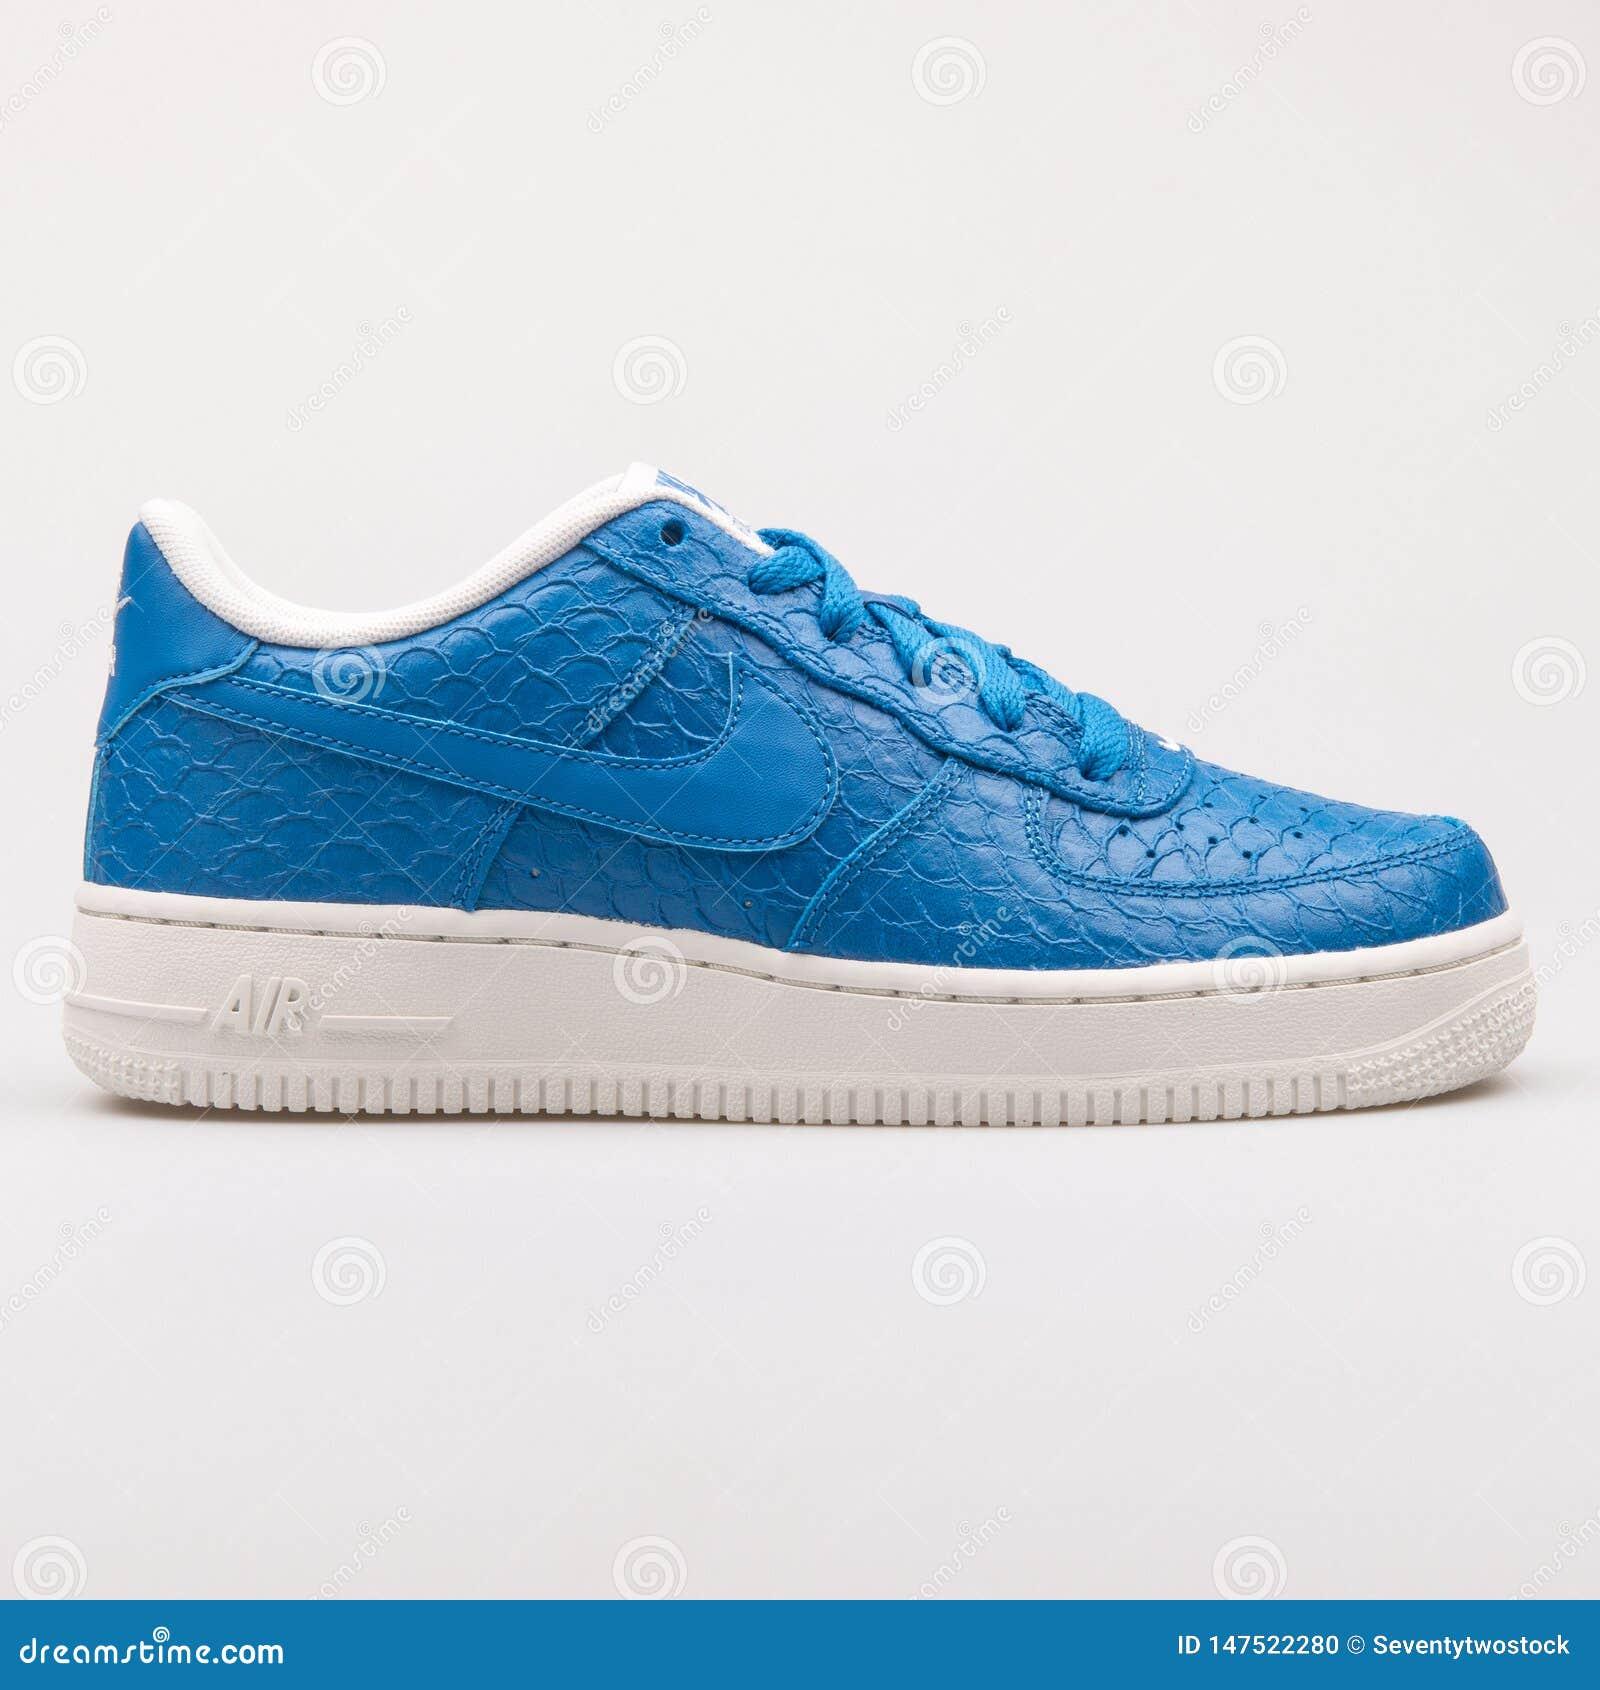 air force 1 azules y blancas